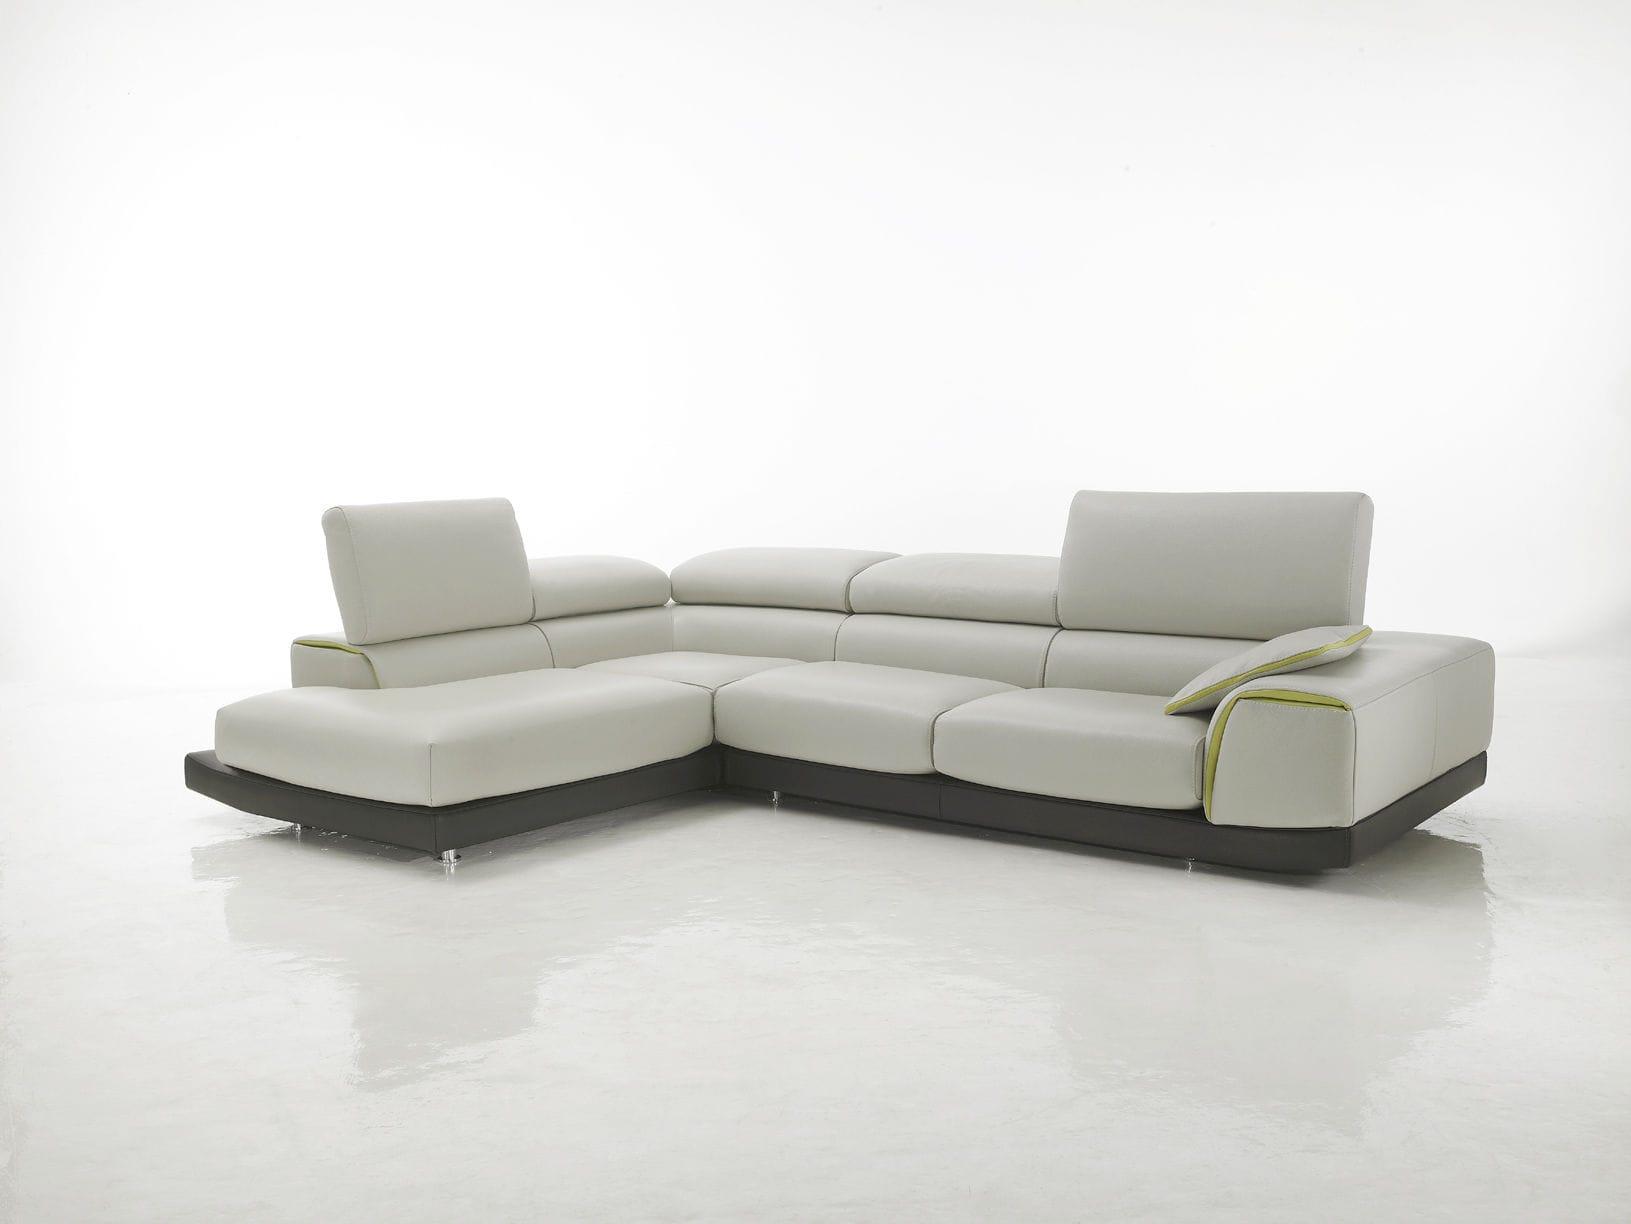 Ecksofa - Cezanne - Very Sofa - Modern / Leder / Stoff concernant Verysofa